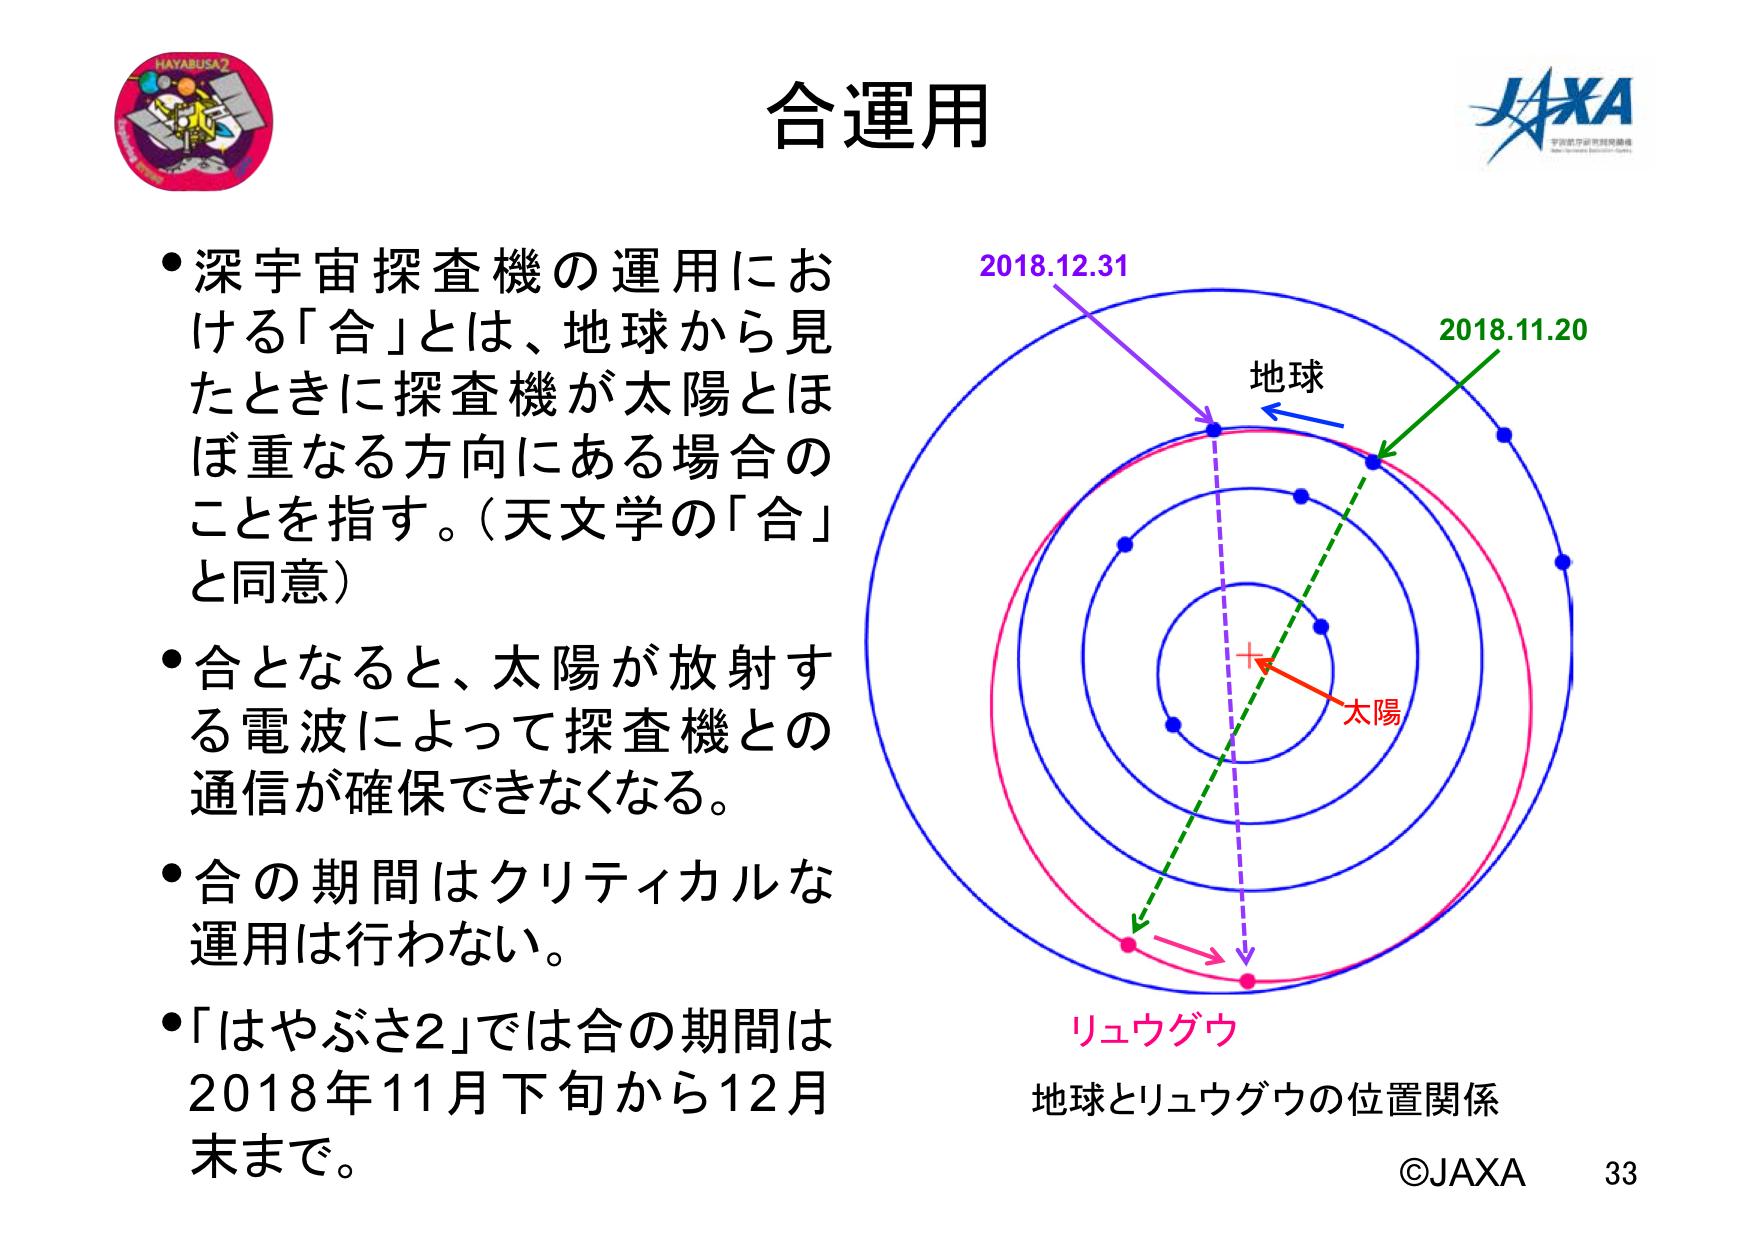 f:id:Imamura:20181011154012p:plain